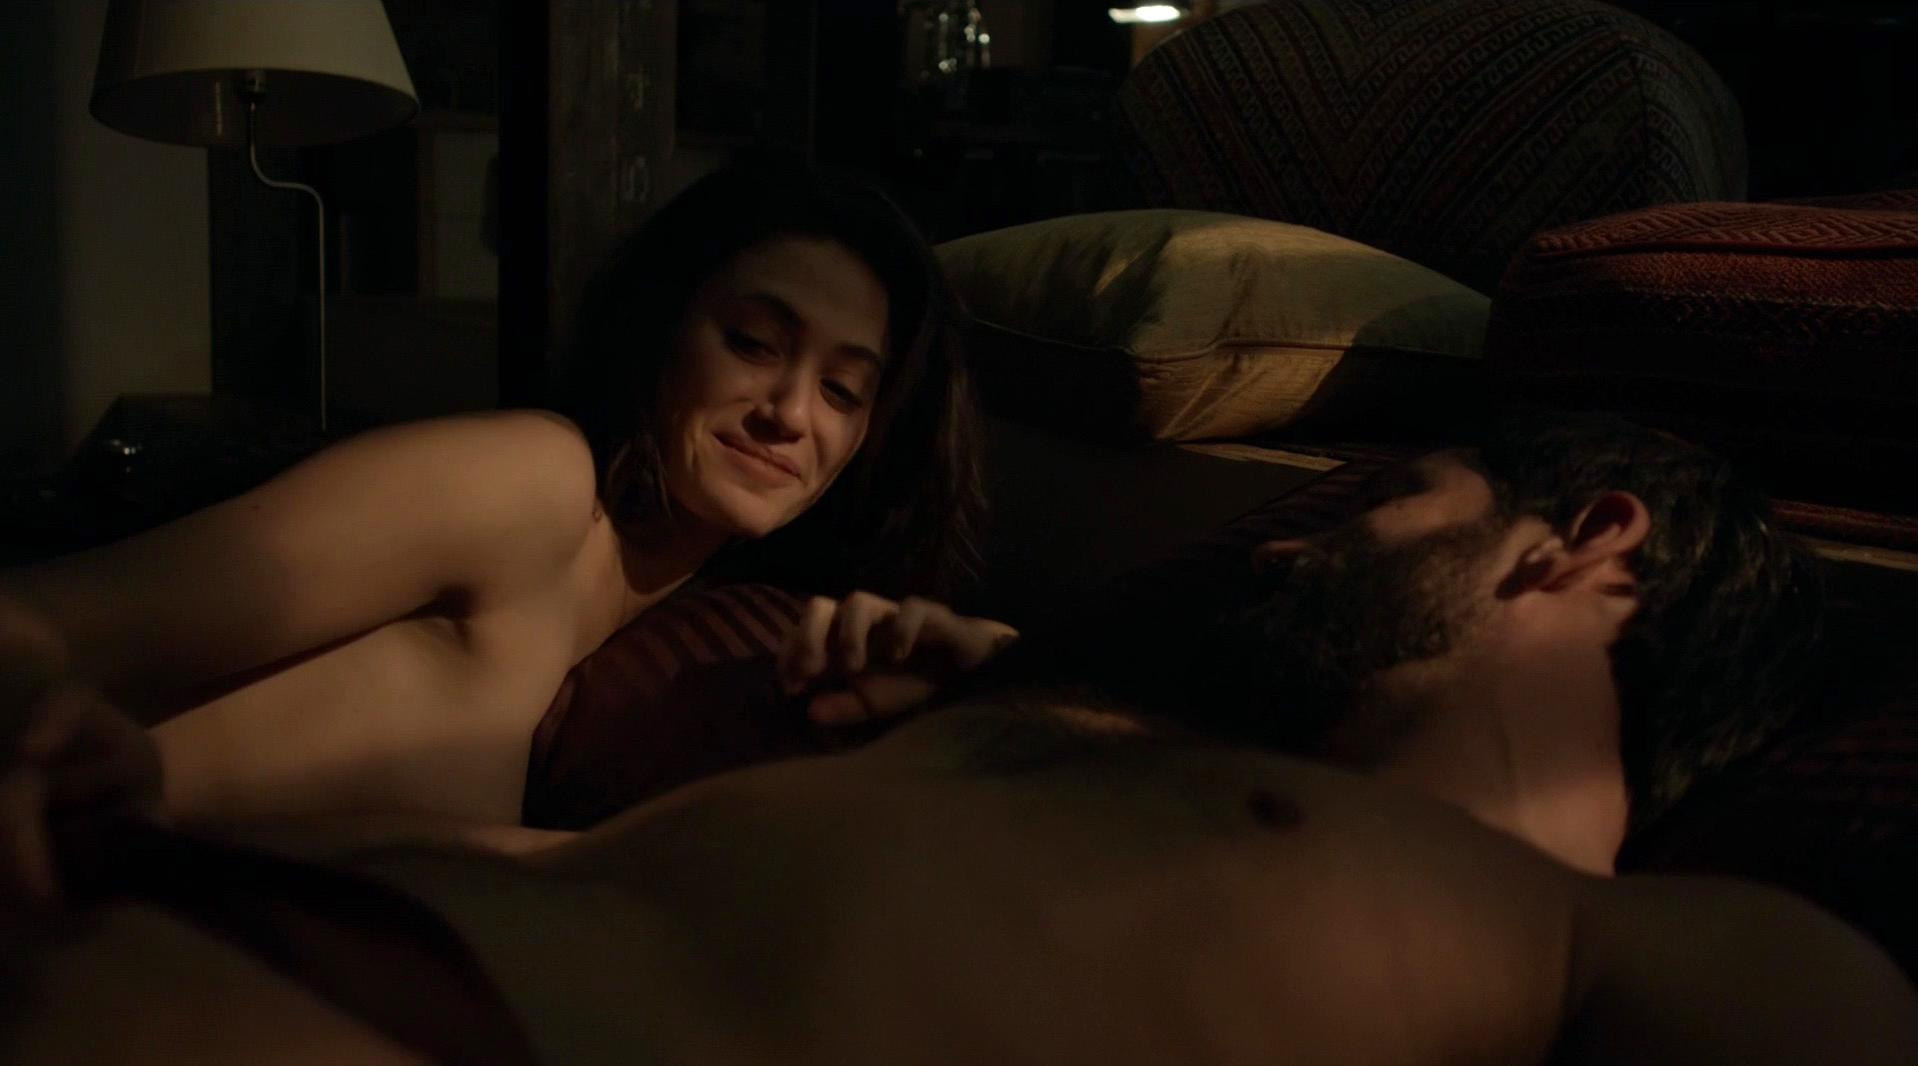 Emmy Rossum nude, Kate Morgan Chadwick nude - Shameless s05e12 (2015)